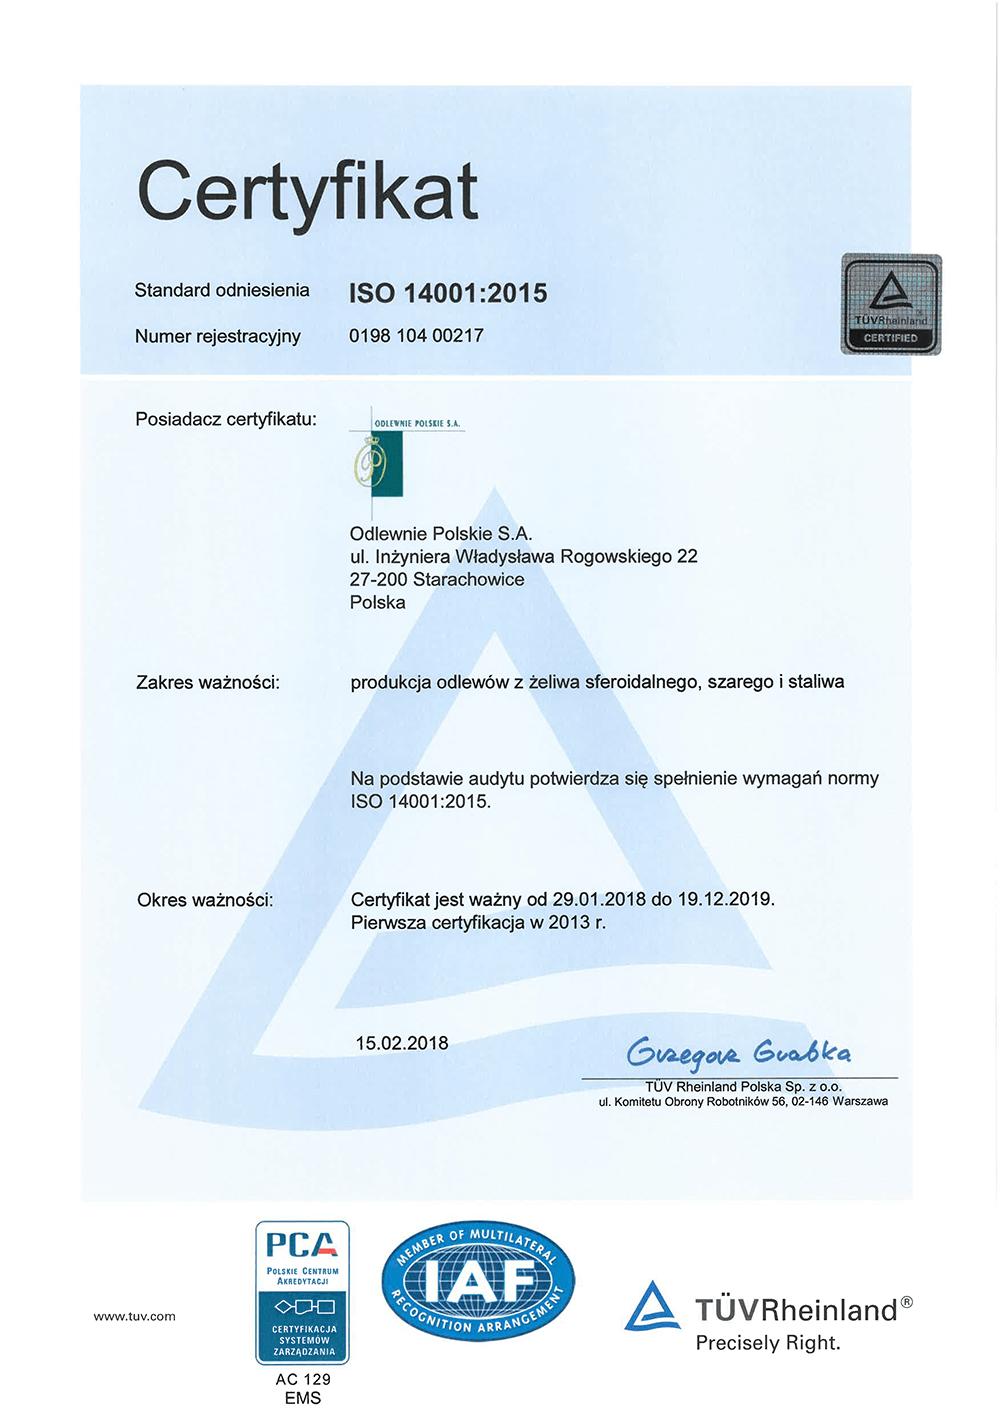 certyfikat_ISO14001-2015_akredytacja_PCA_pl